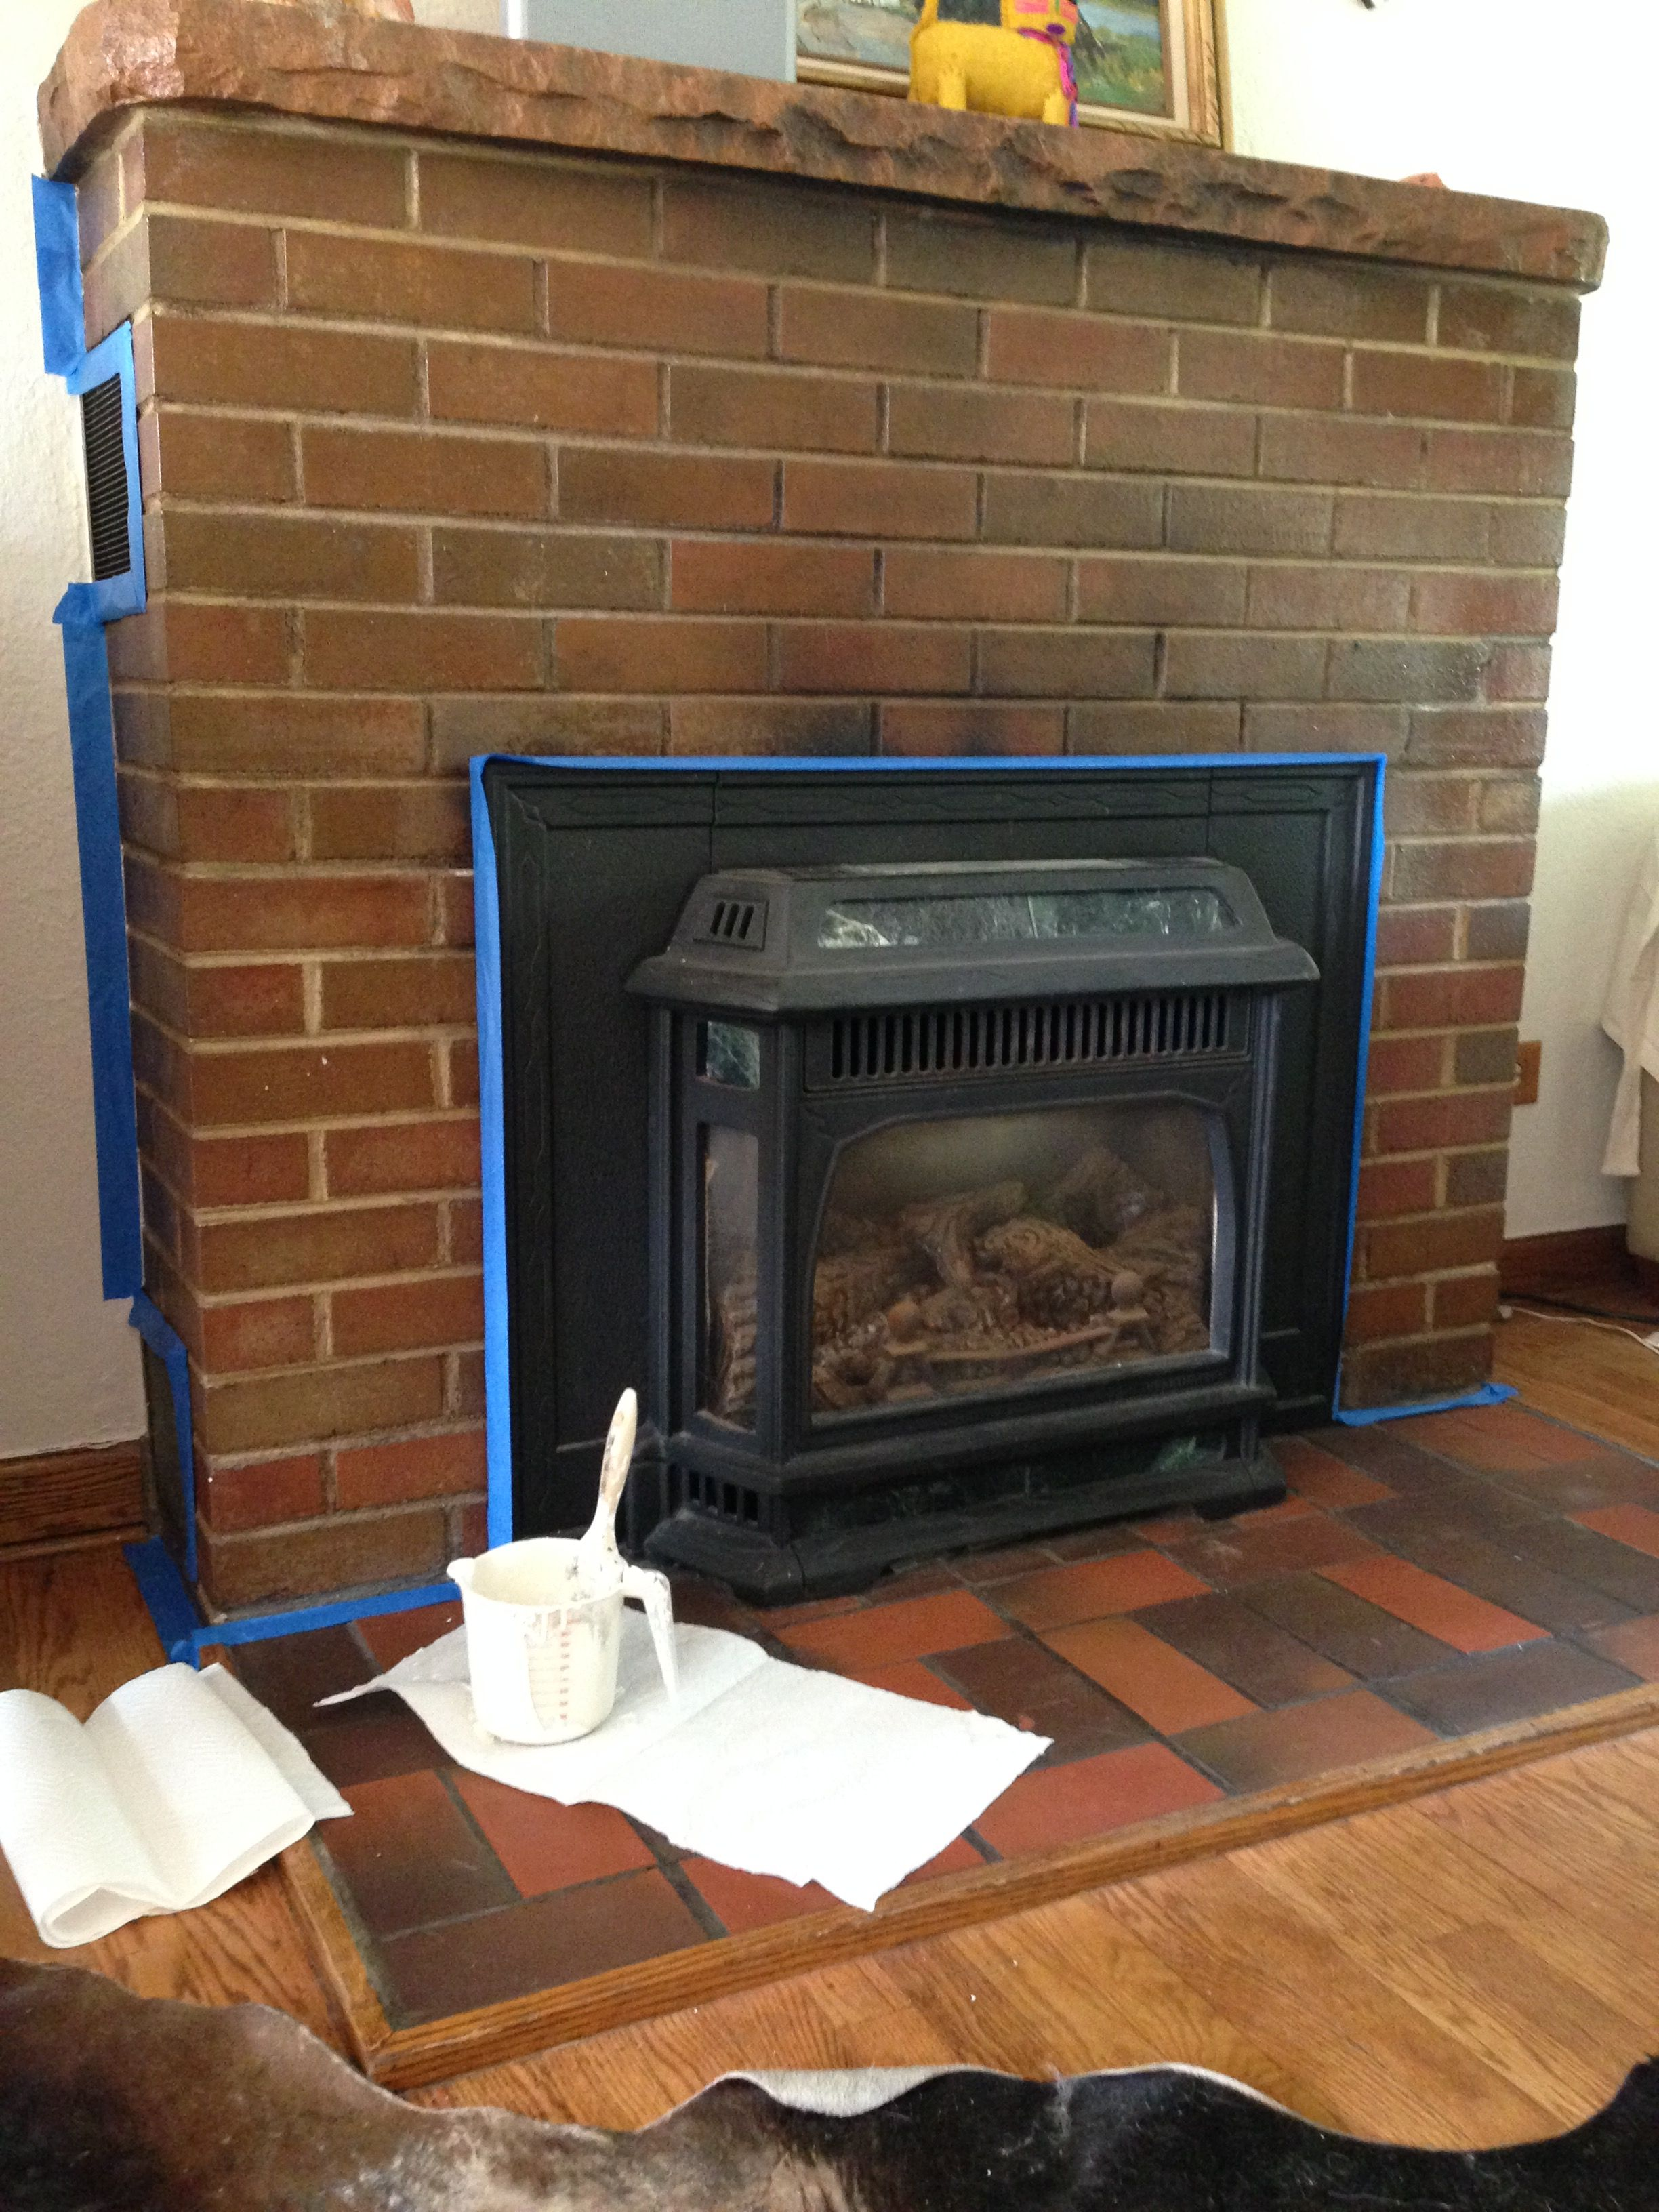 Adding a fireplace adding a fireplace to a house artificial fireplace best fireplace insert best gas